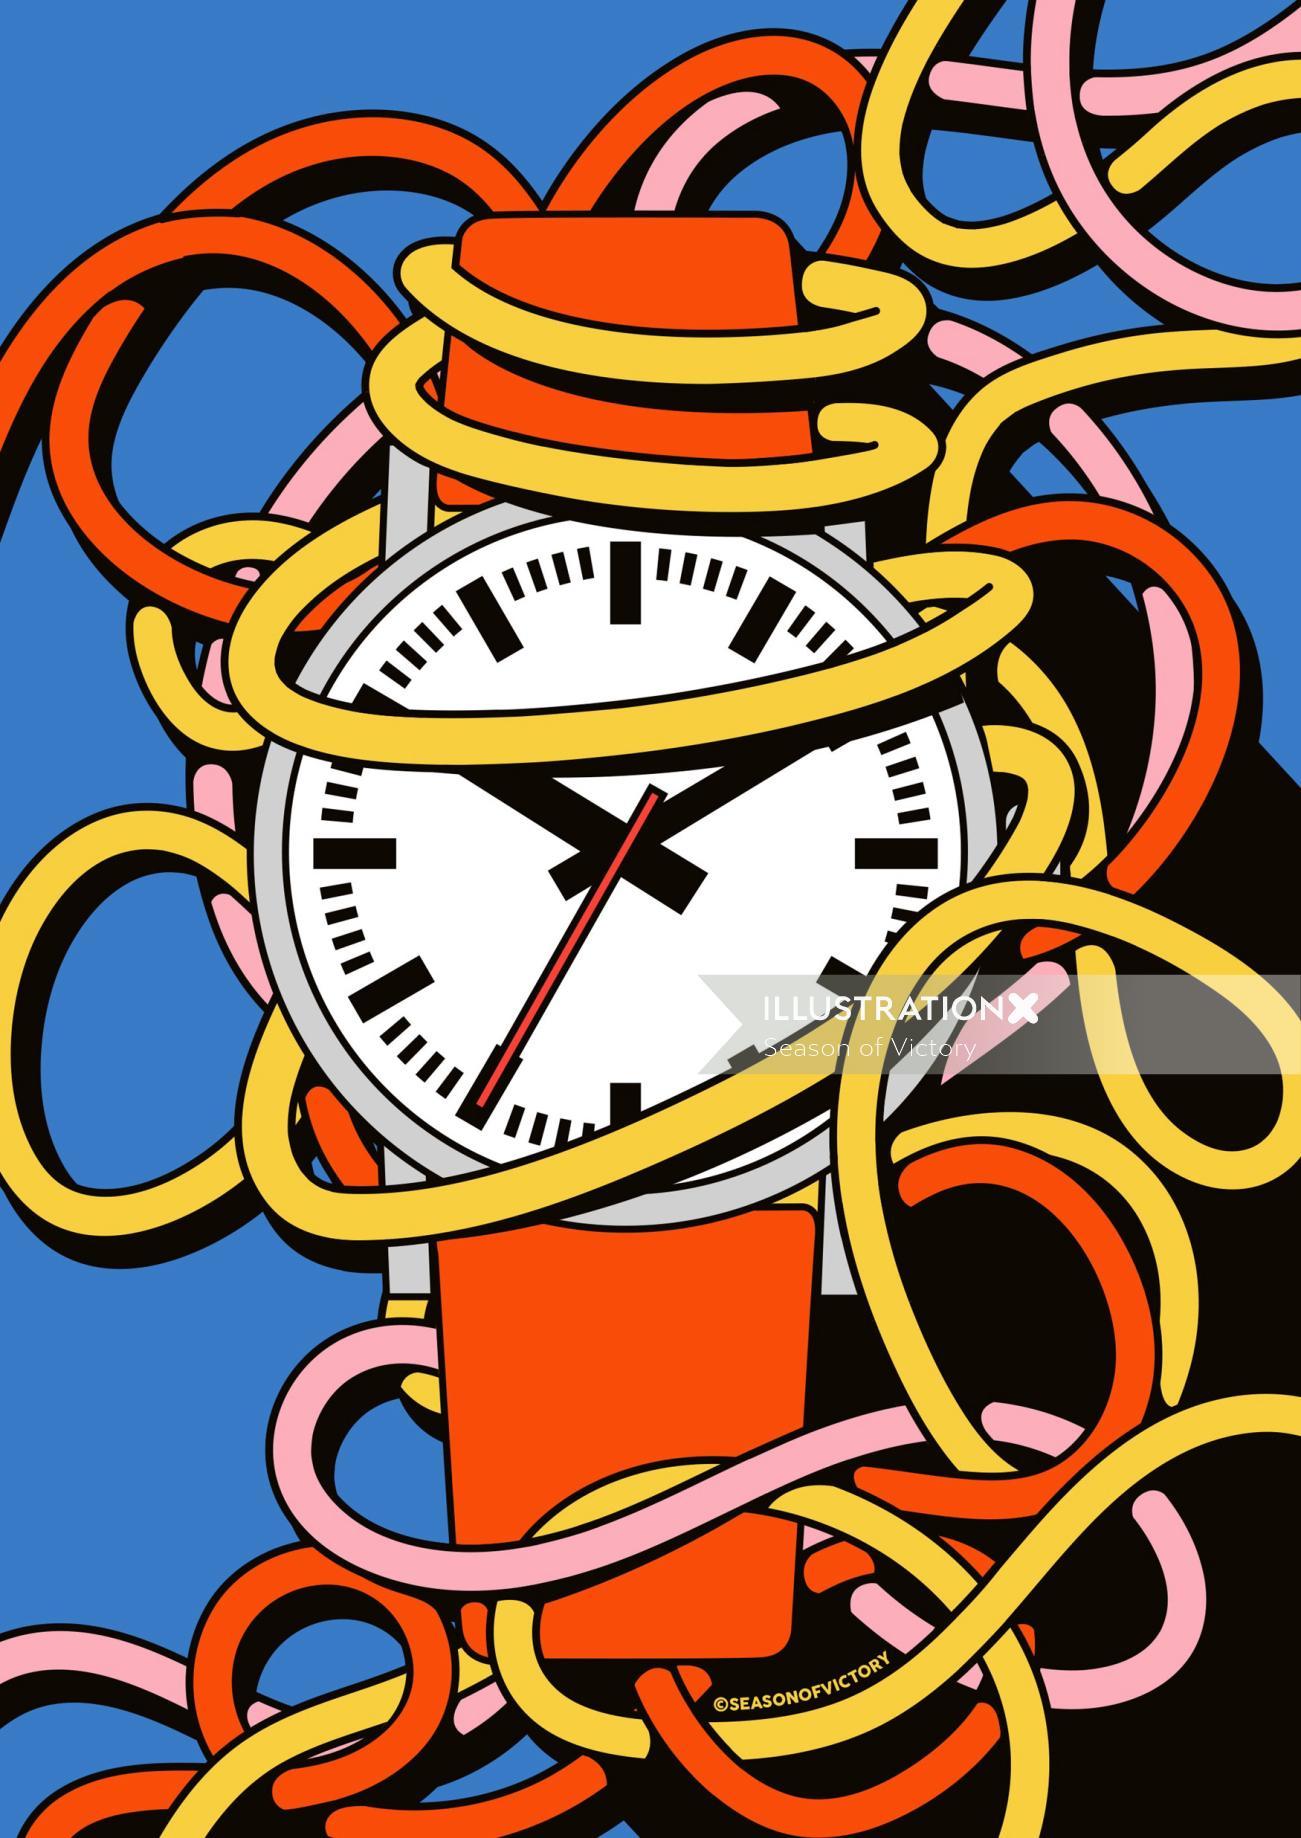 poster, coverart, watch, time, illustration, editorial, magazine, branding, spot illustration, time,